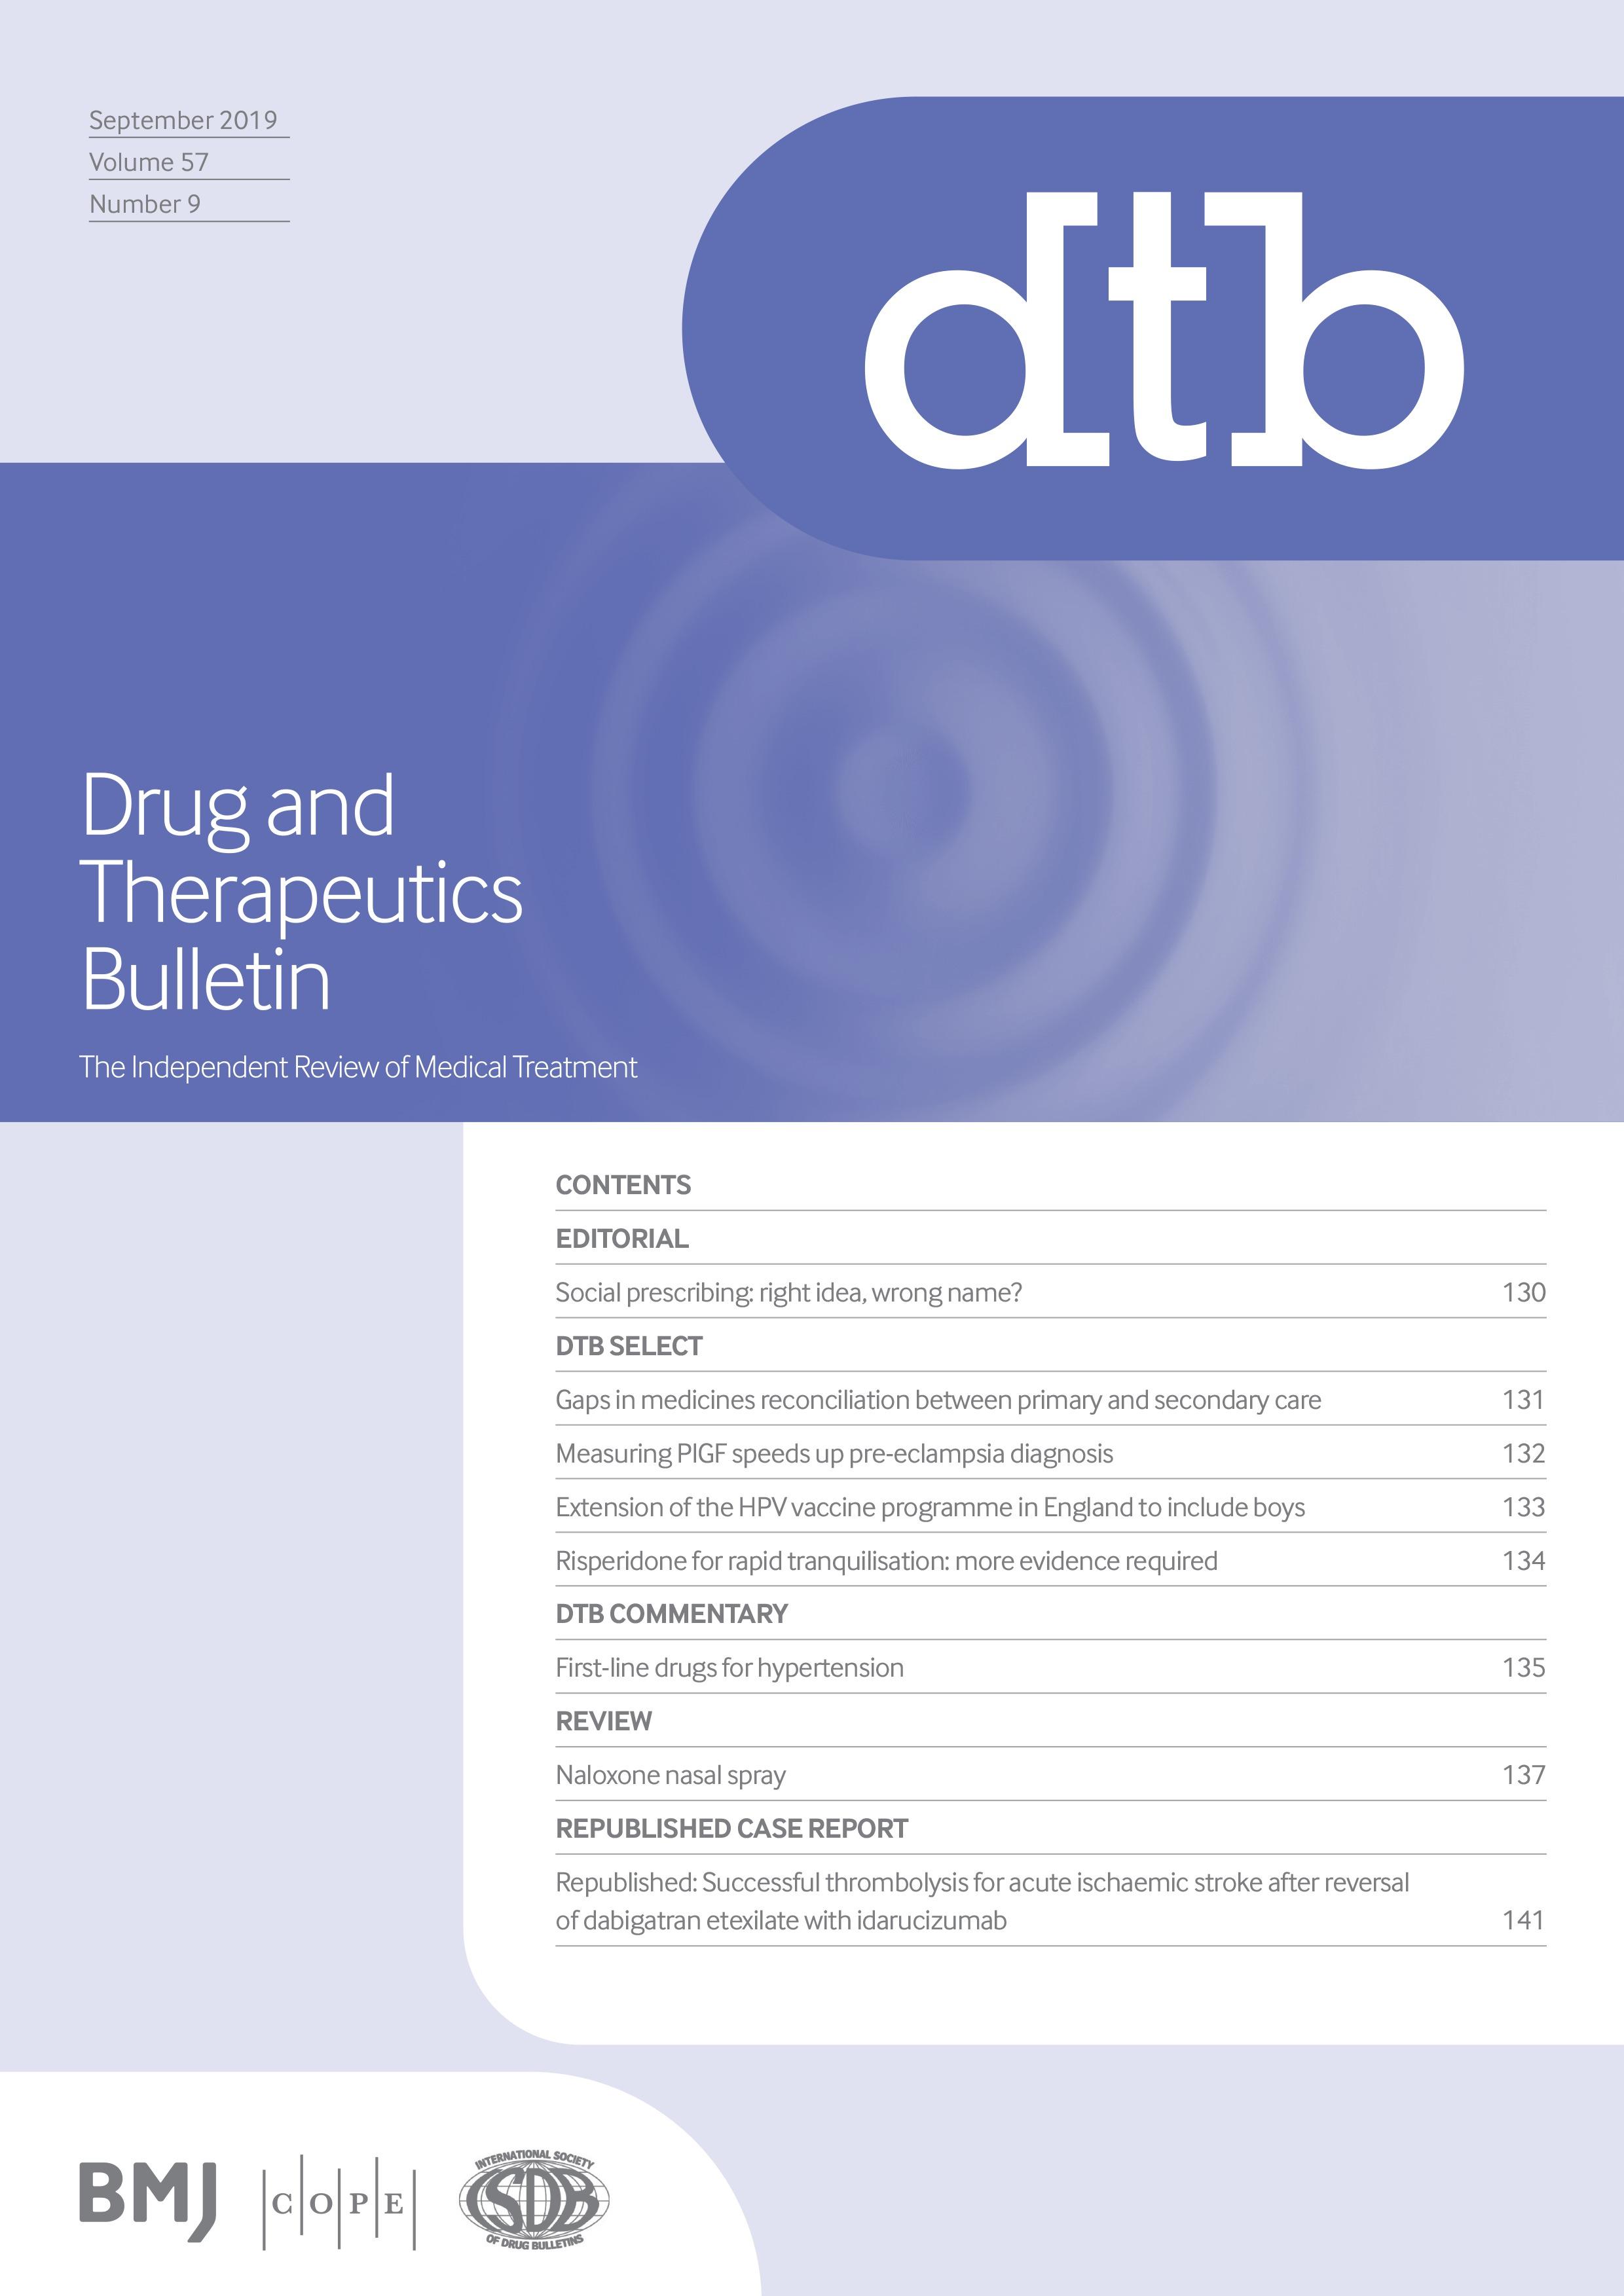 Naloxone nasal spray   Drug and Therapeutics Bulletin